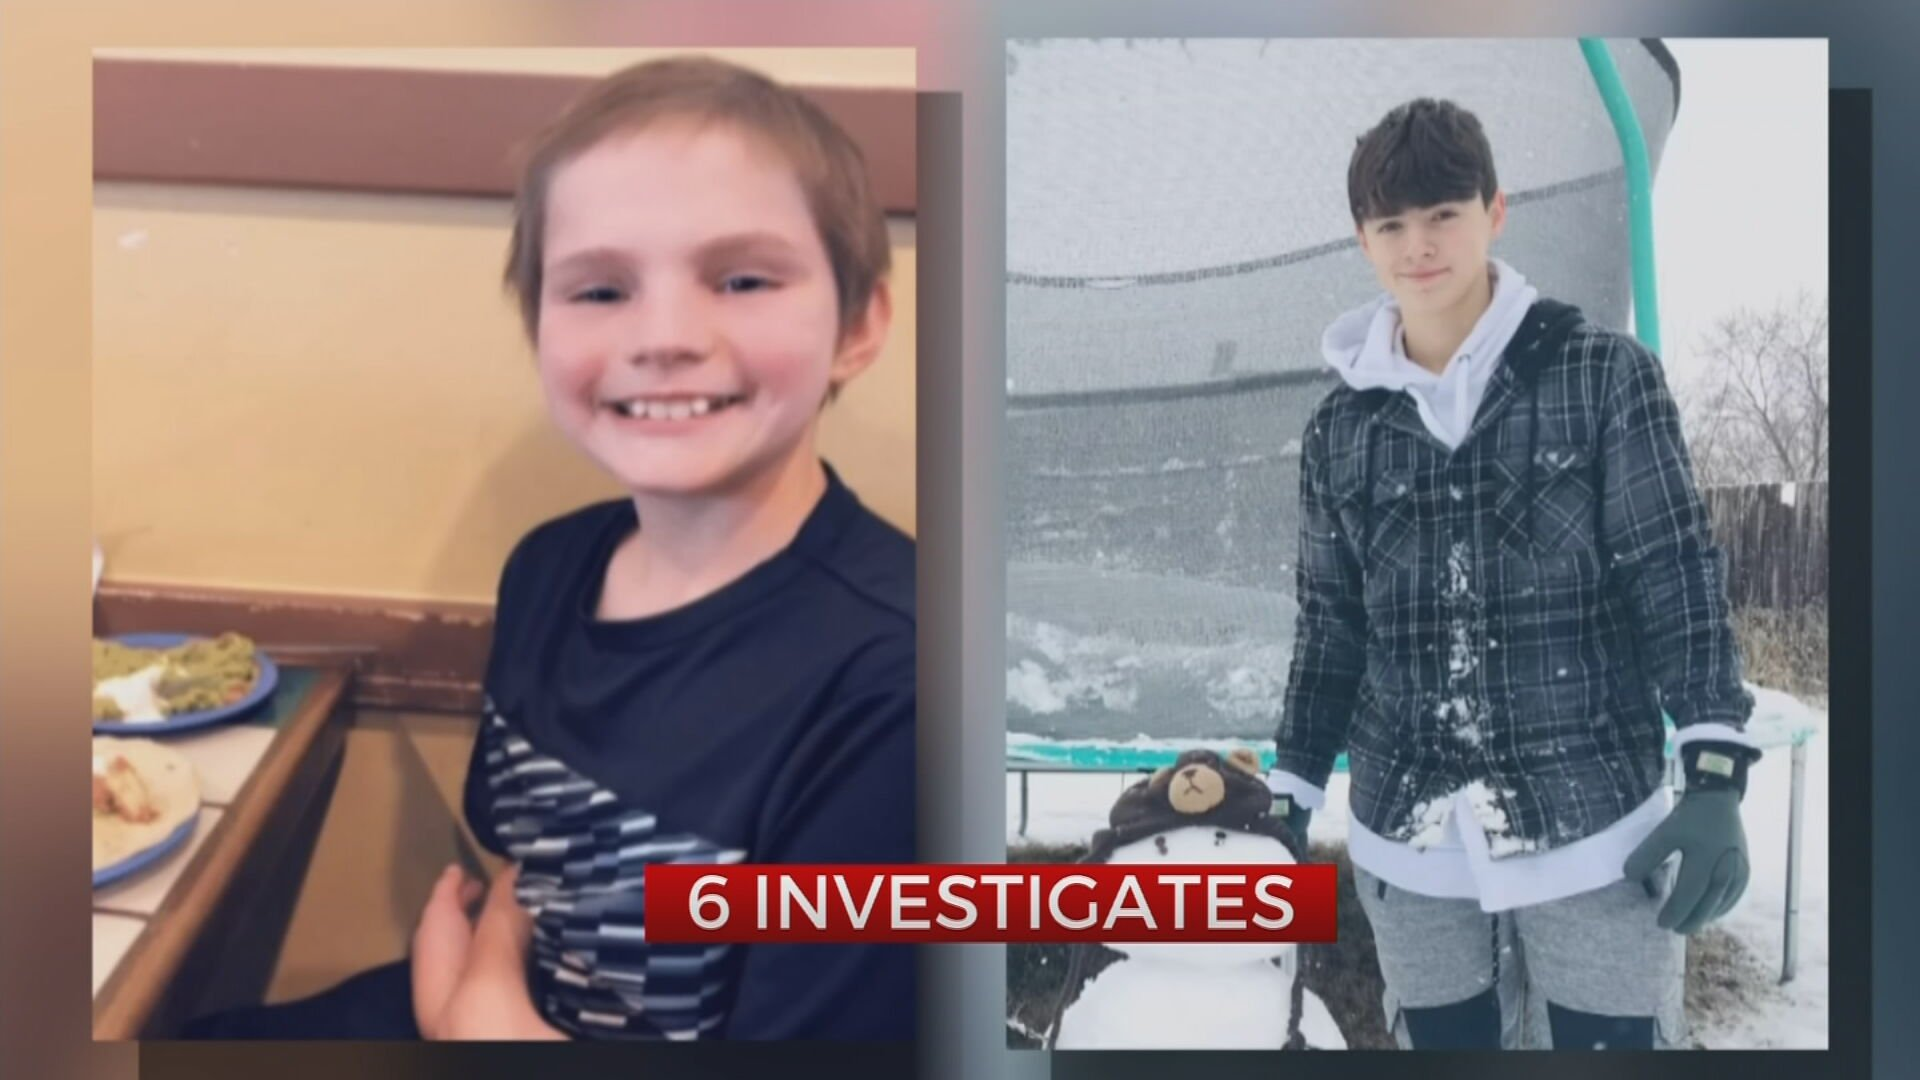 6 Investigates: Who Failed Rylan & Cameron? (Part 1)